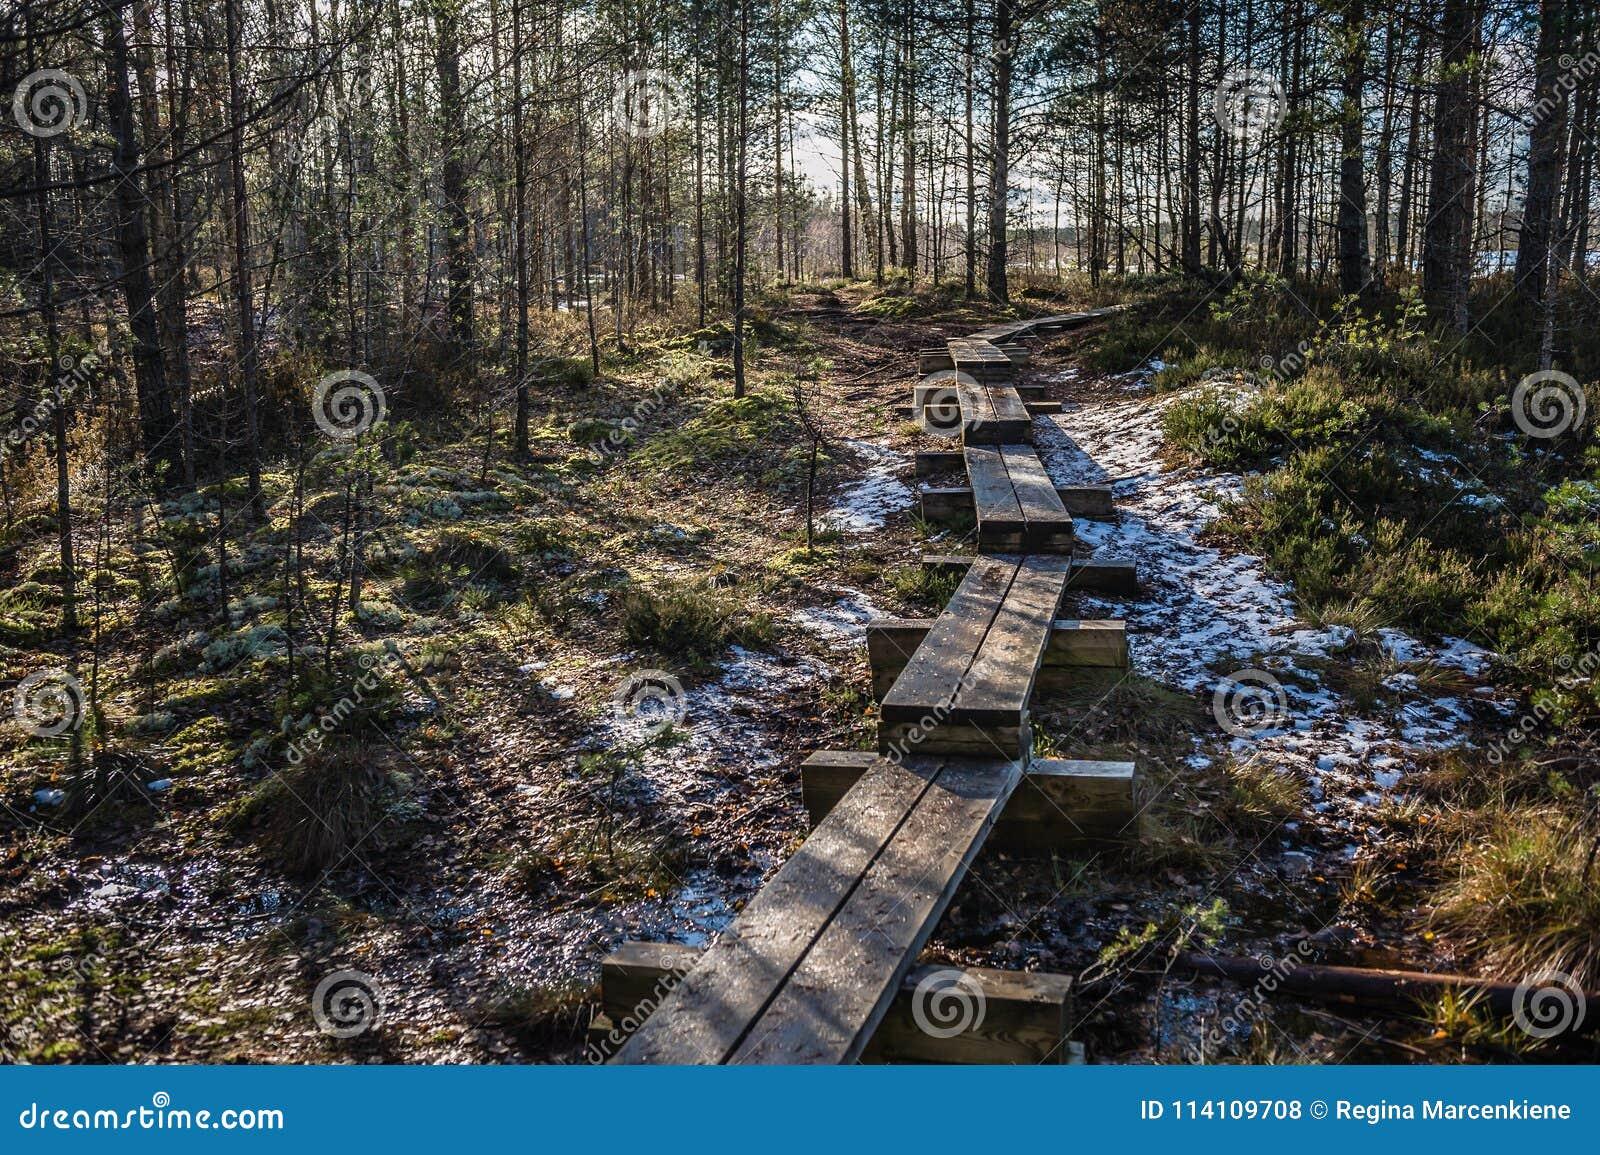 Bog boardwalk is a popular tourist destination in Lahemaa National Park. Estonia. Early springs.